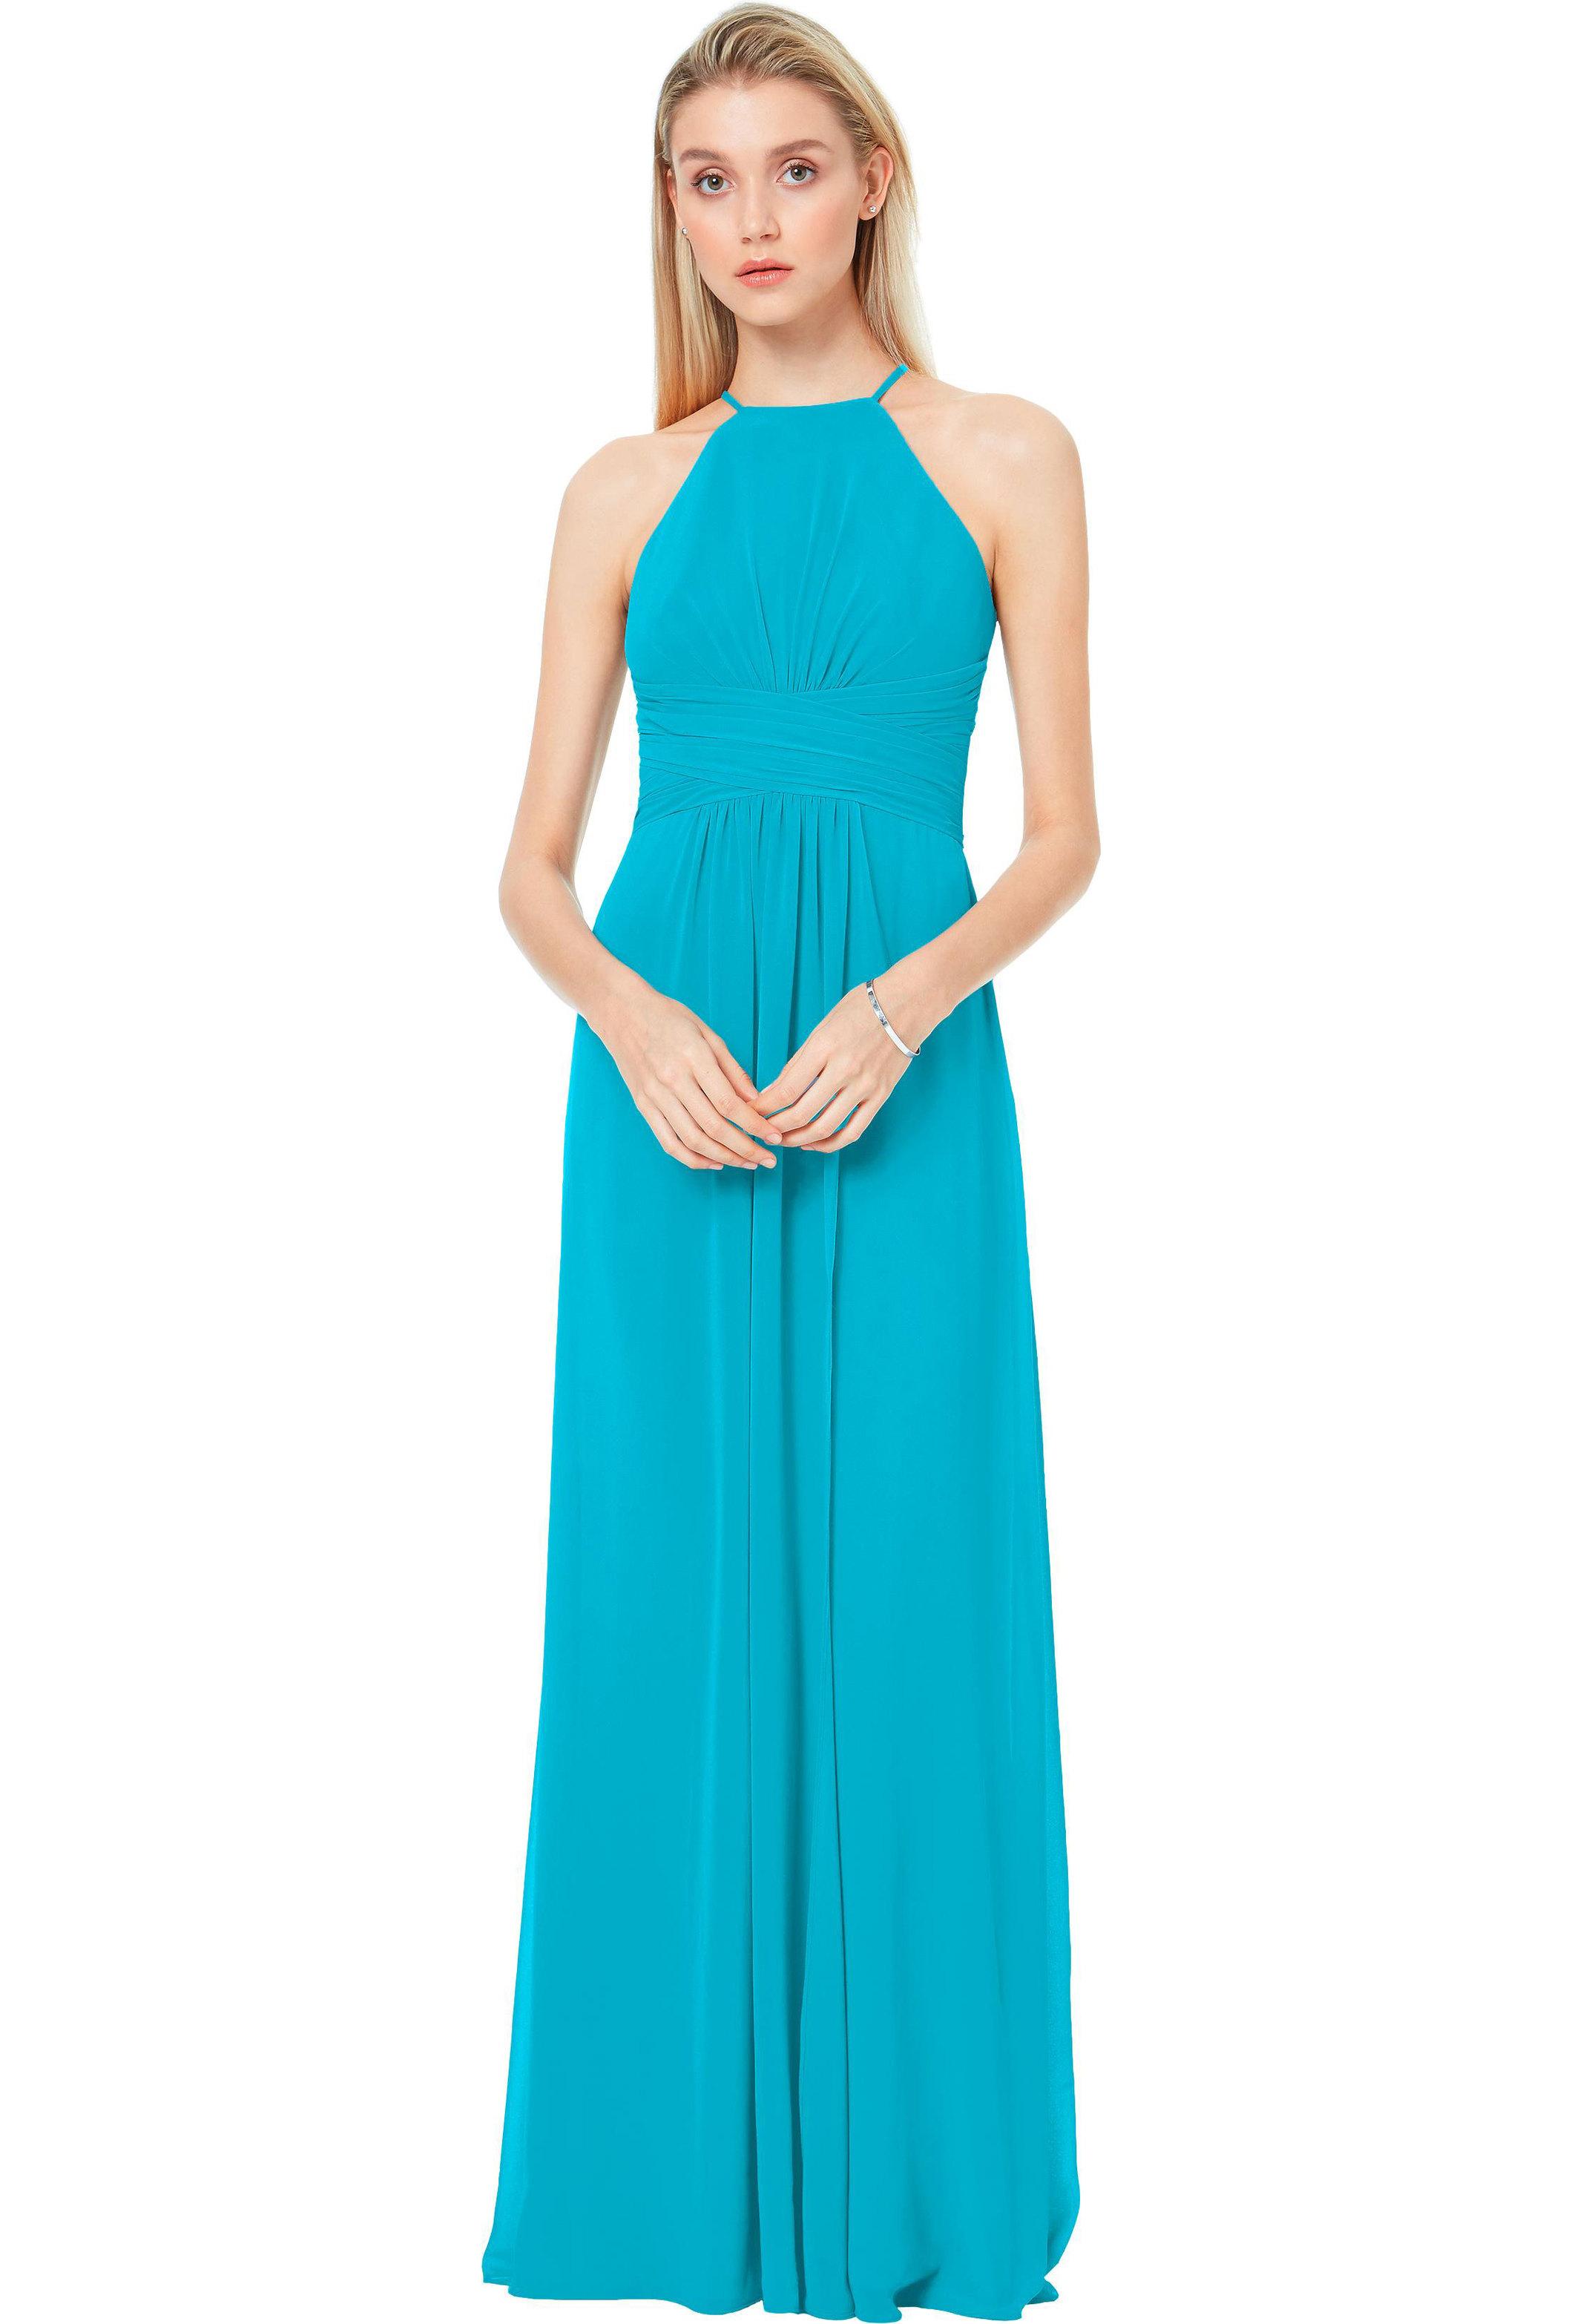 Bill Levkoff OASIS Chiffon Spaghetti Strap A-line gown, $200.00 Front